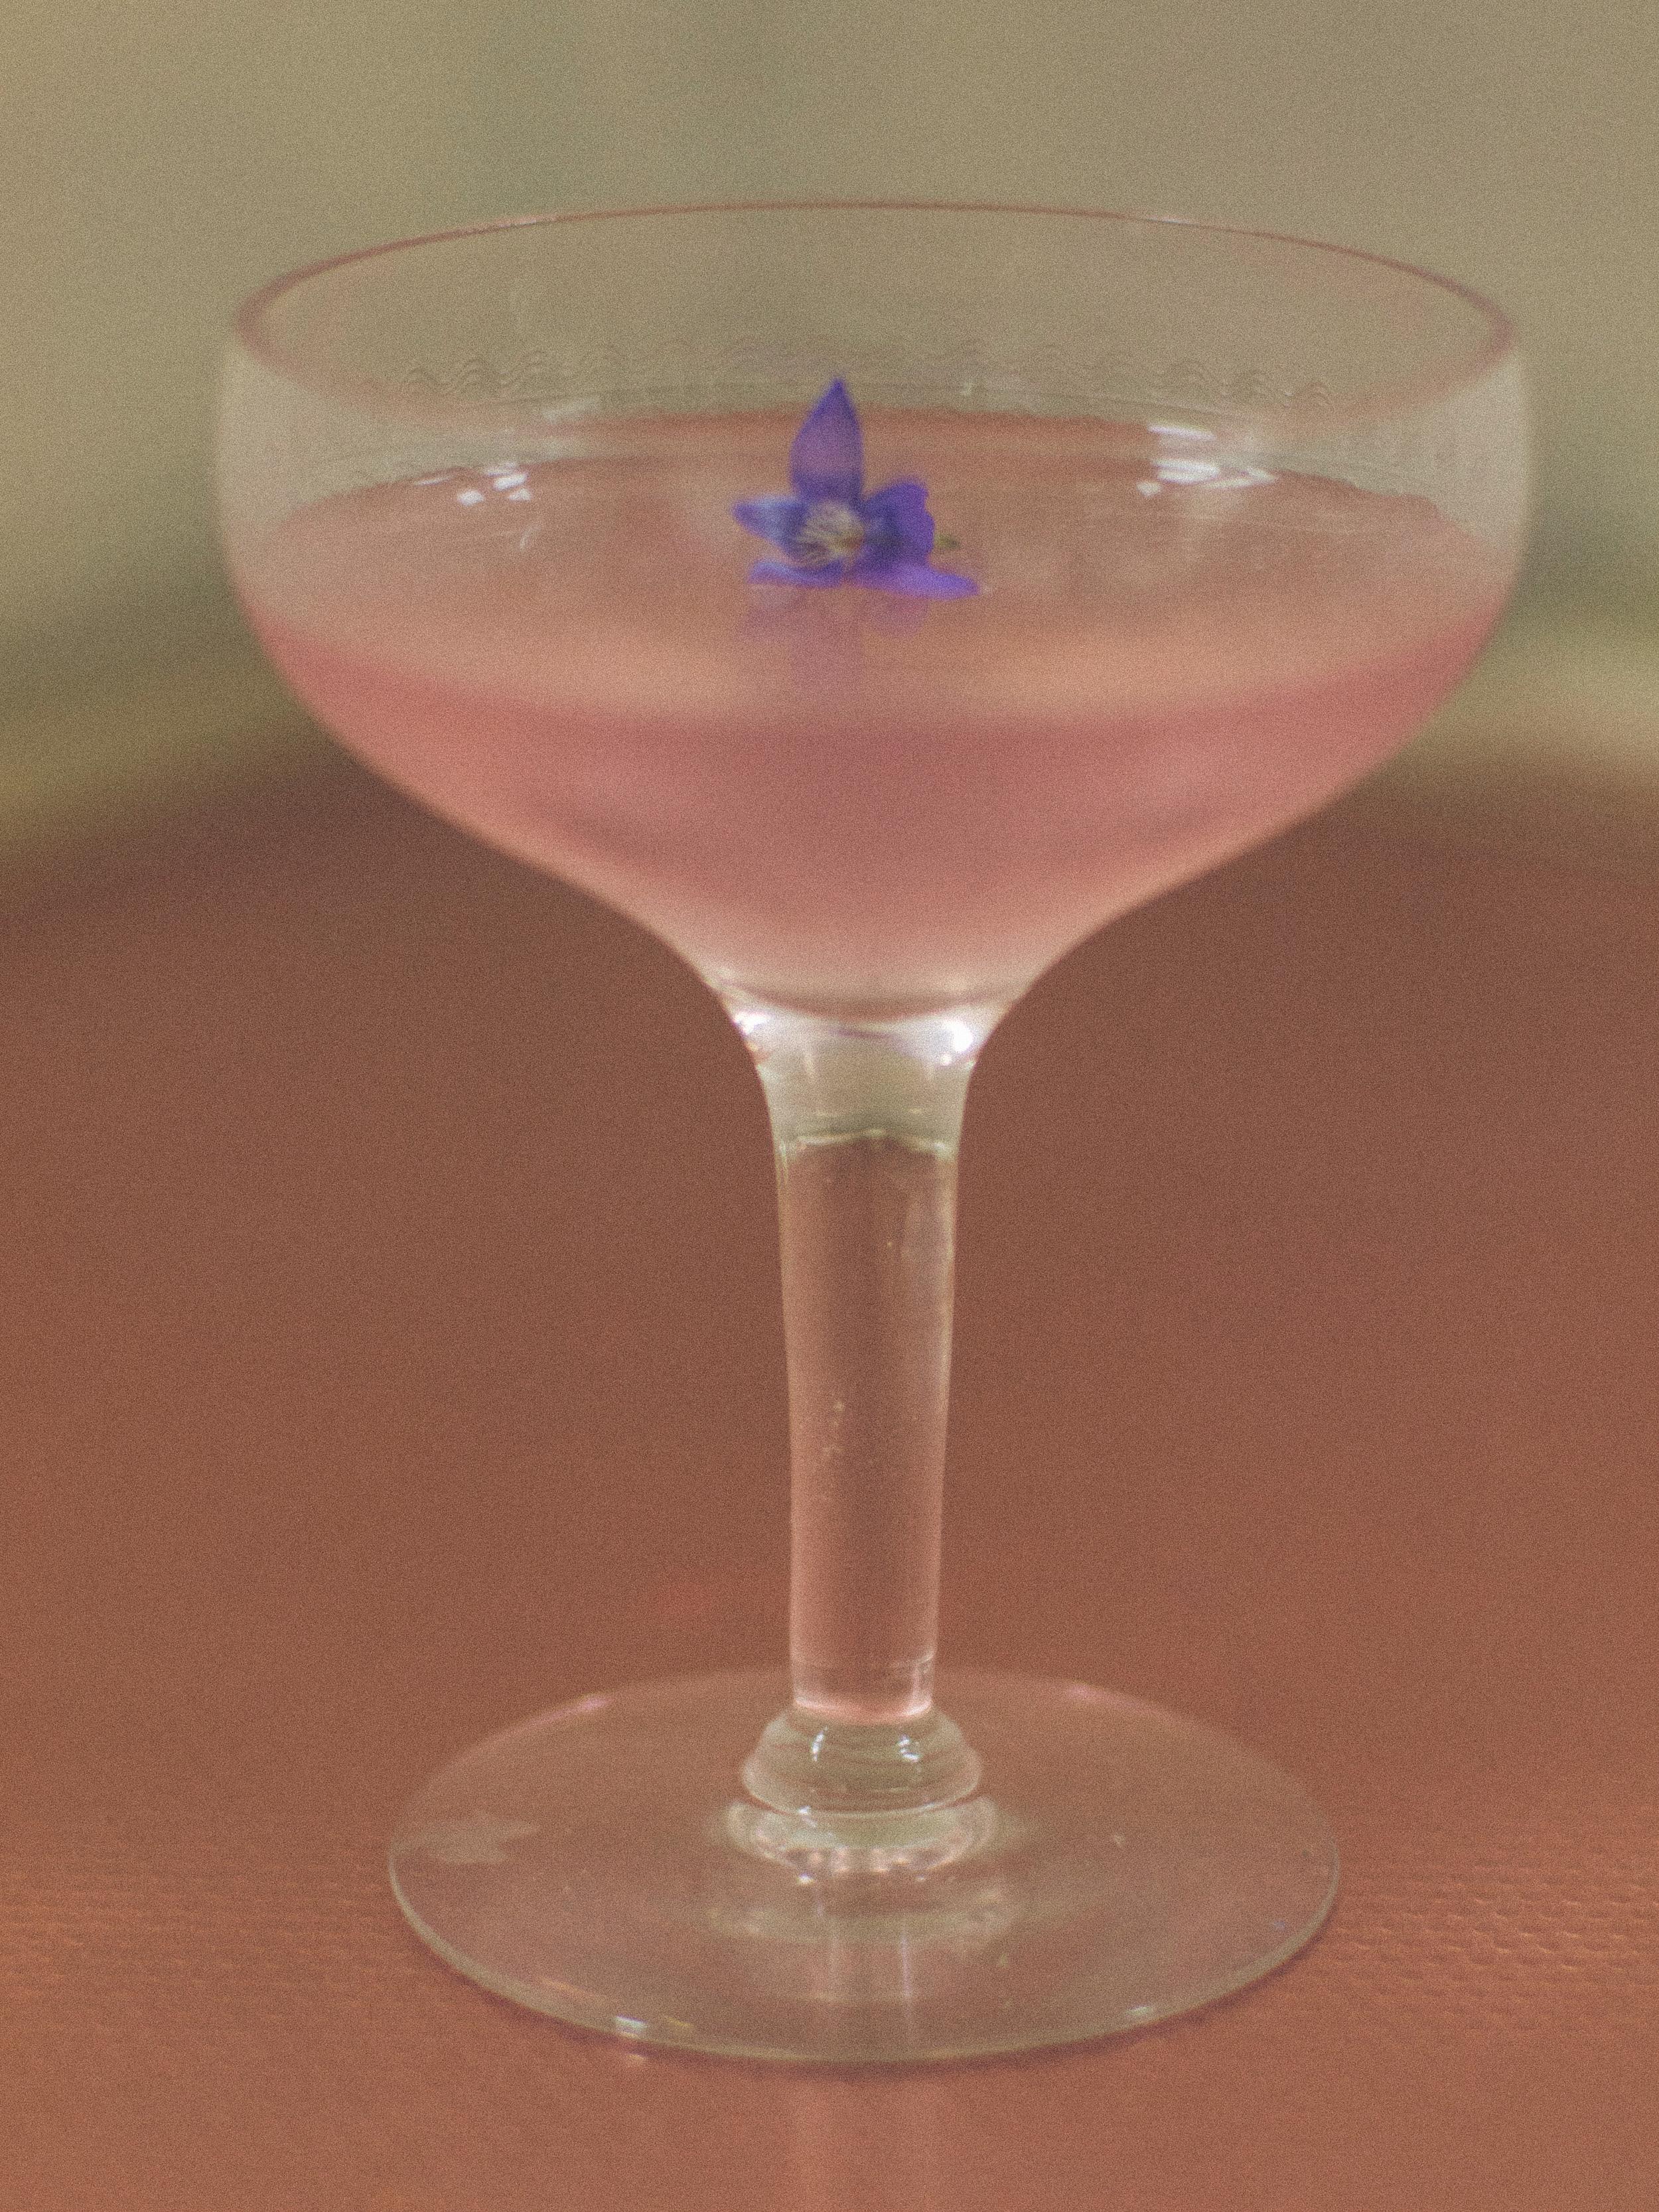 America Village - The Wild Violet Cocktail